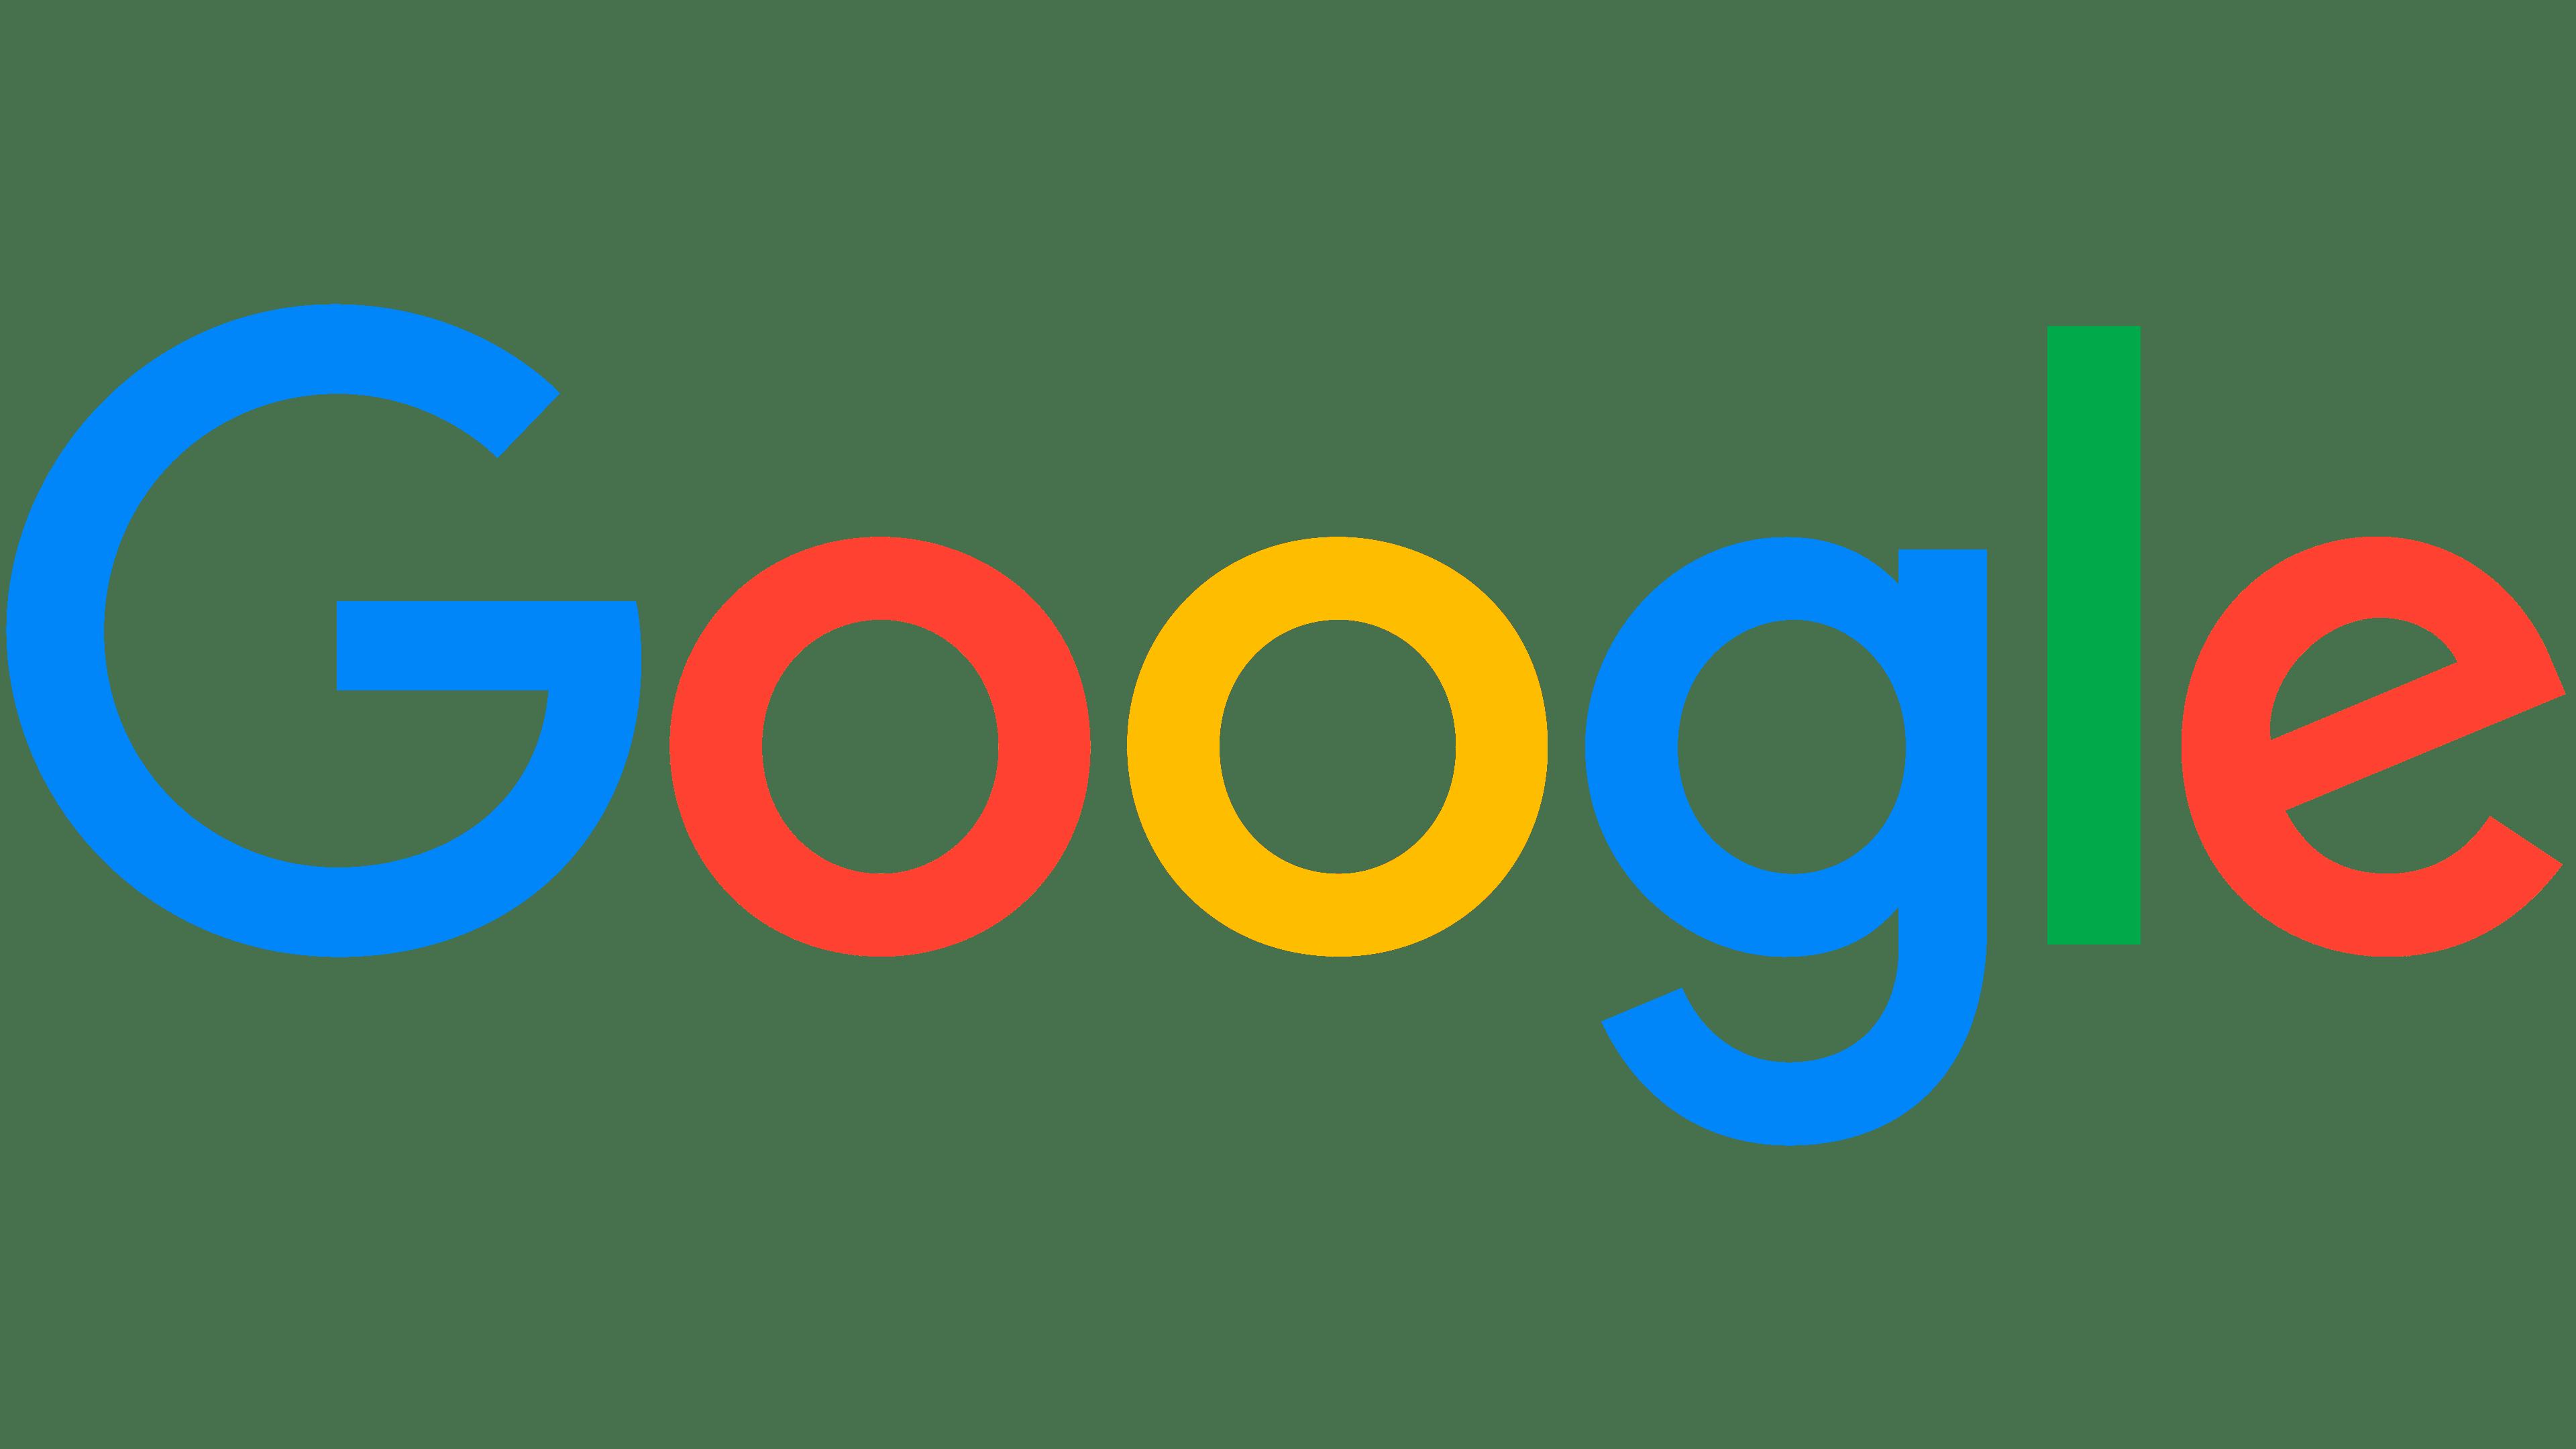 https://controlfreak.com.sg/wp-content/uploads/2021/01/Google-Logo.png